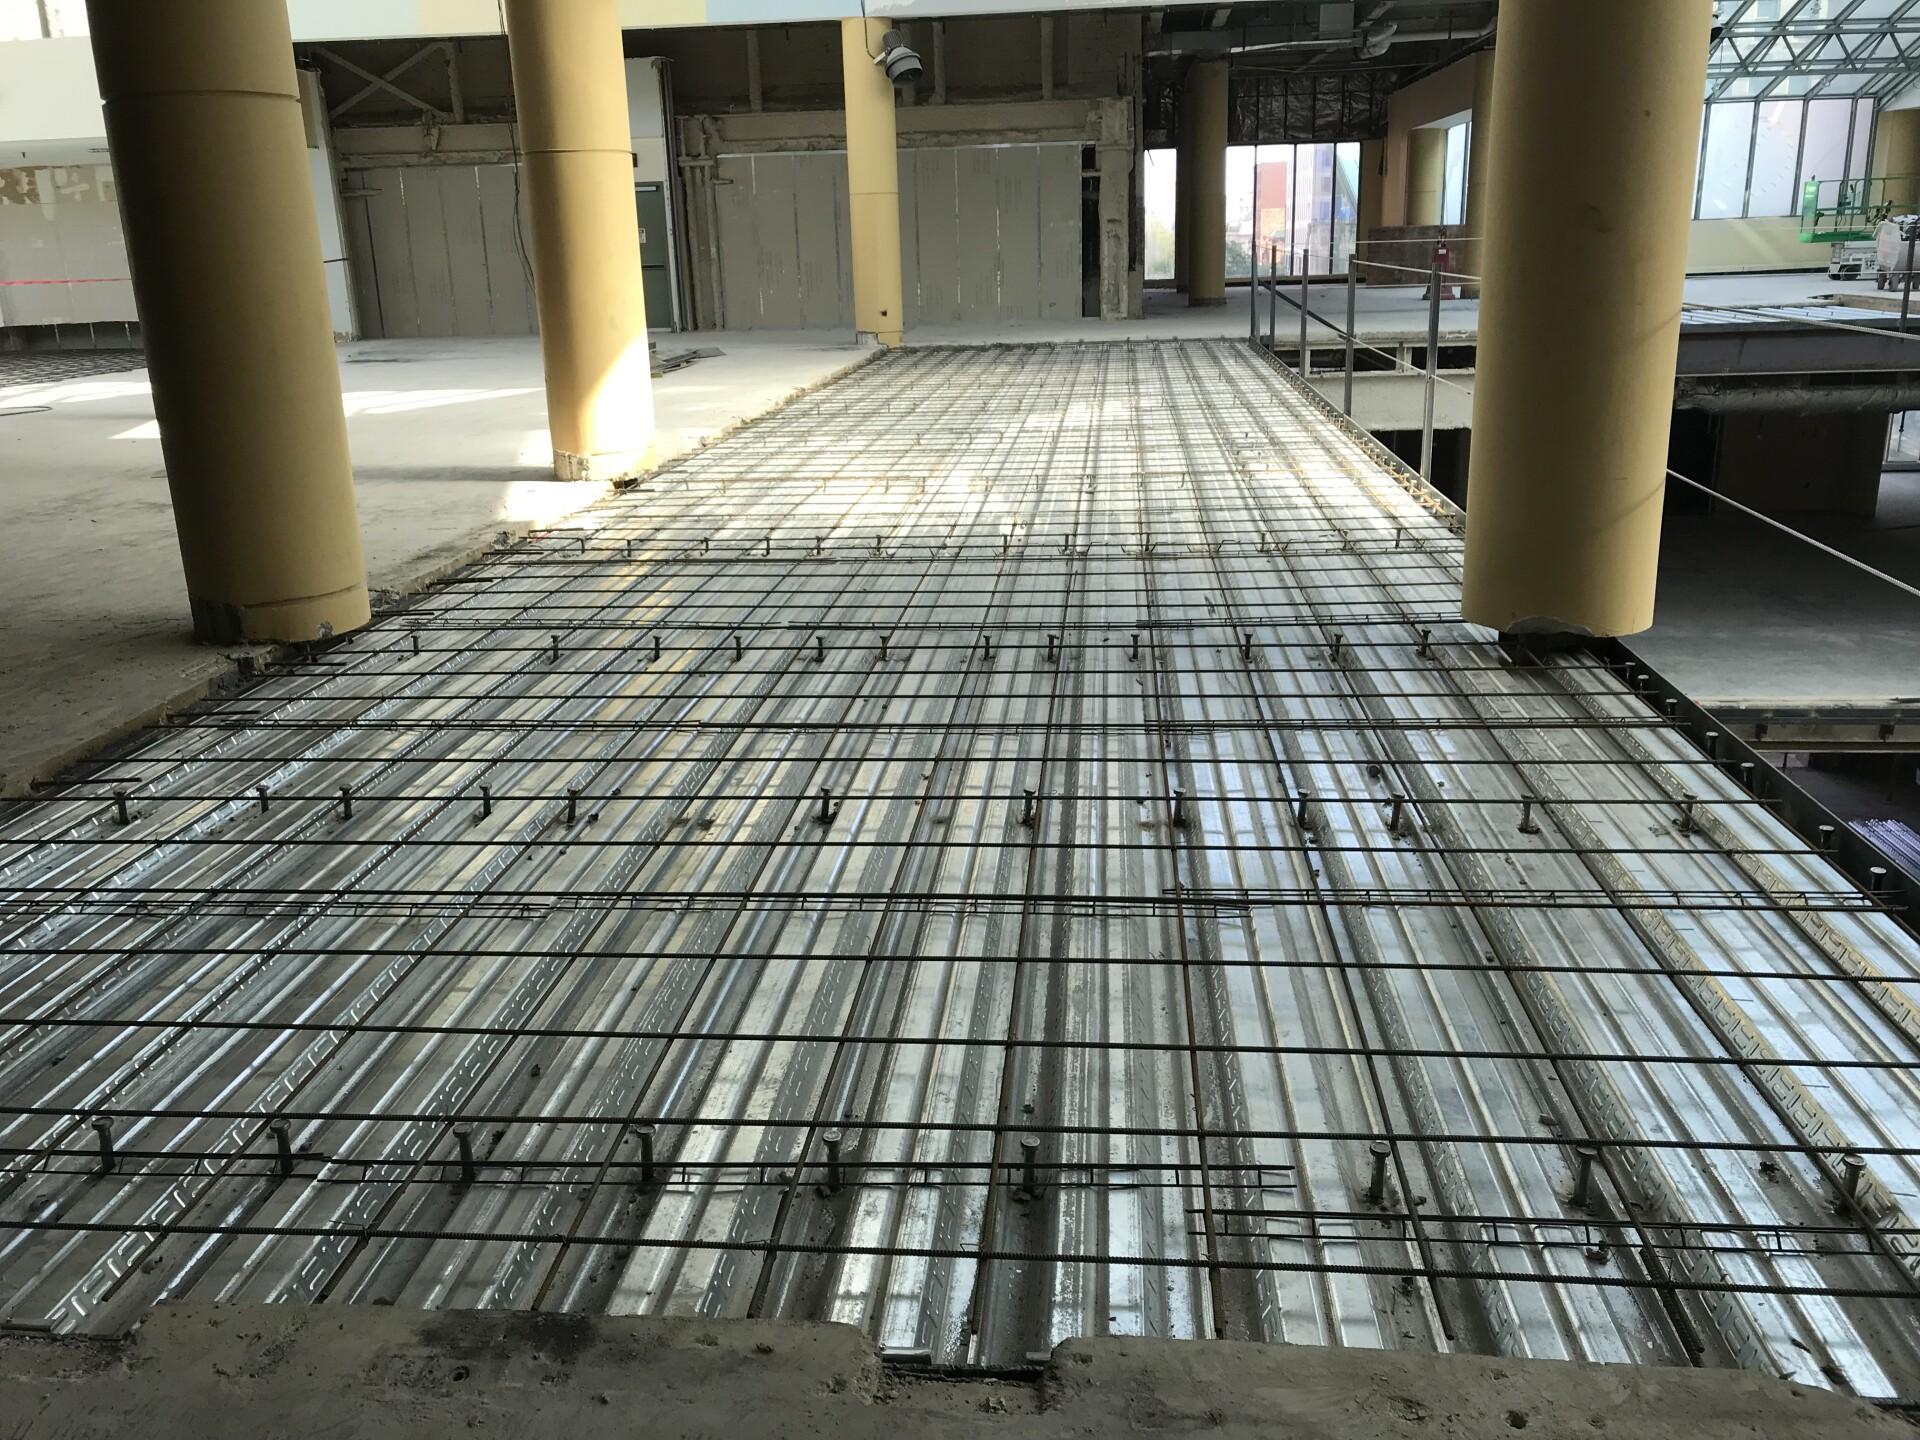 A look inside the Grand Avenue renovation.